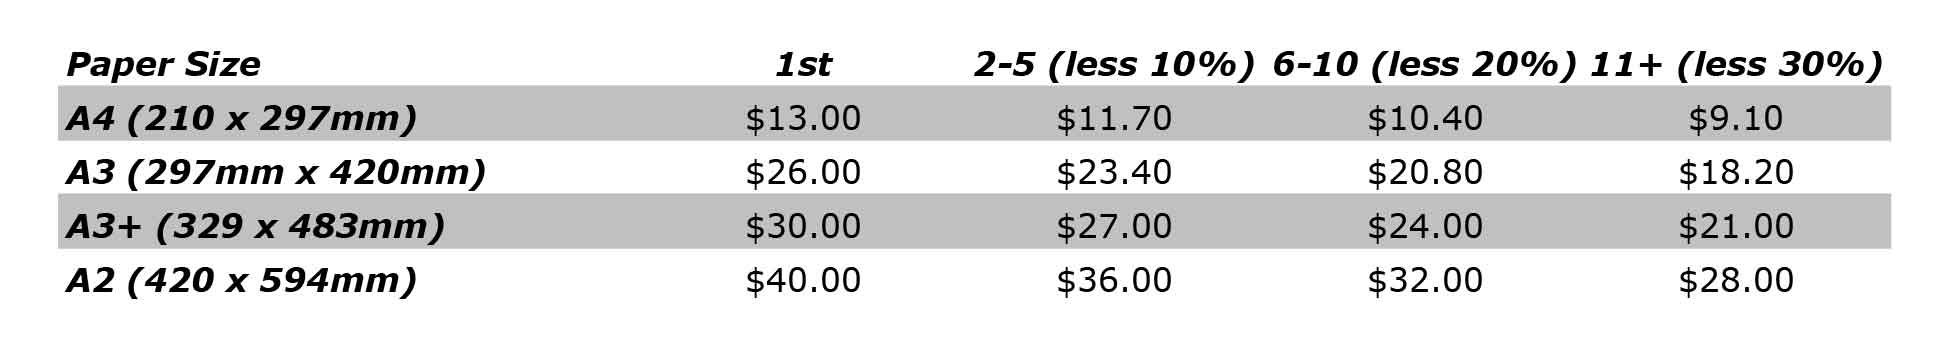 sheet-media-price-01.jpg